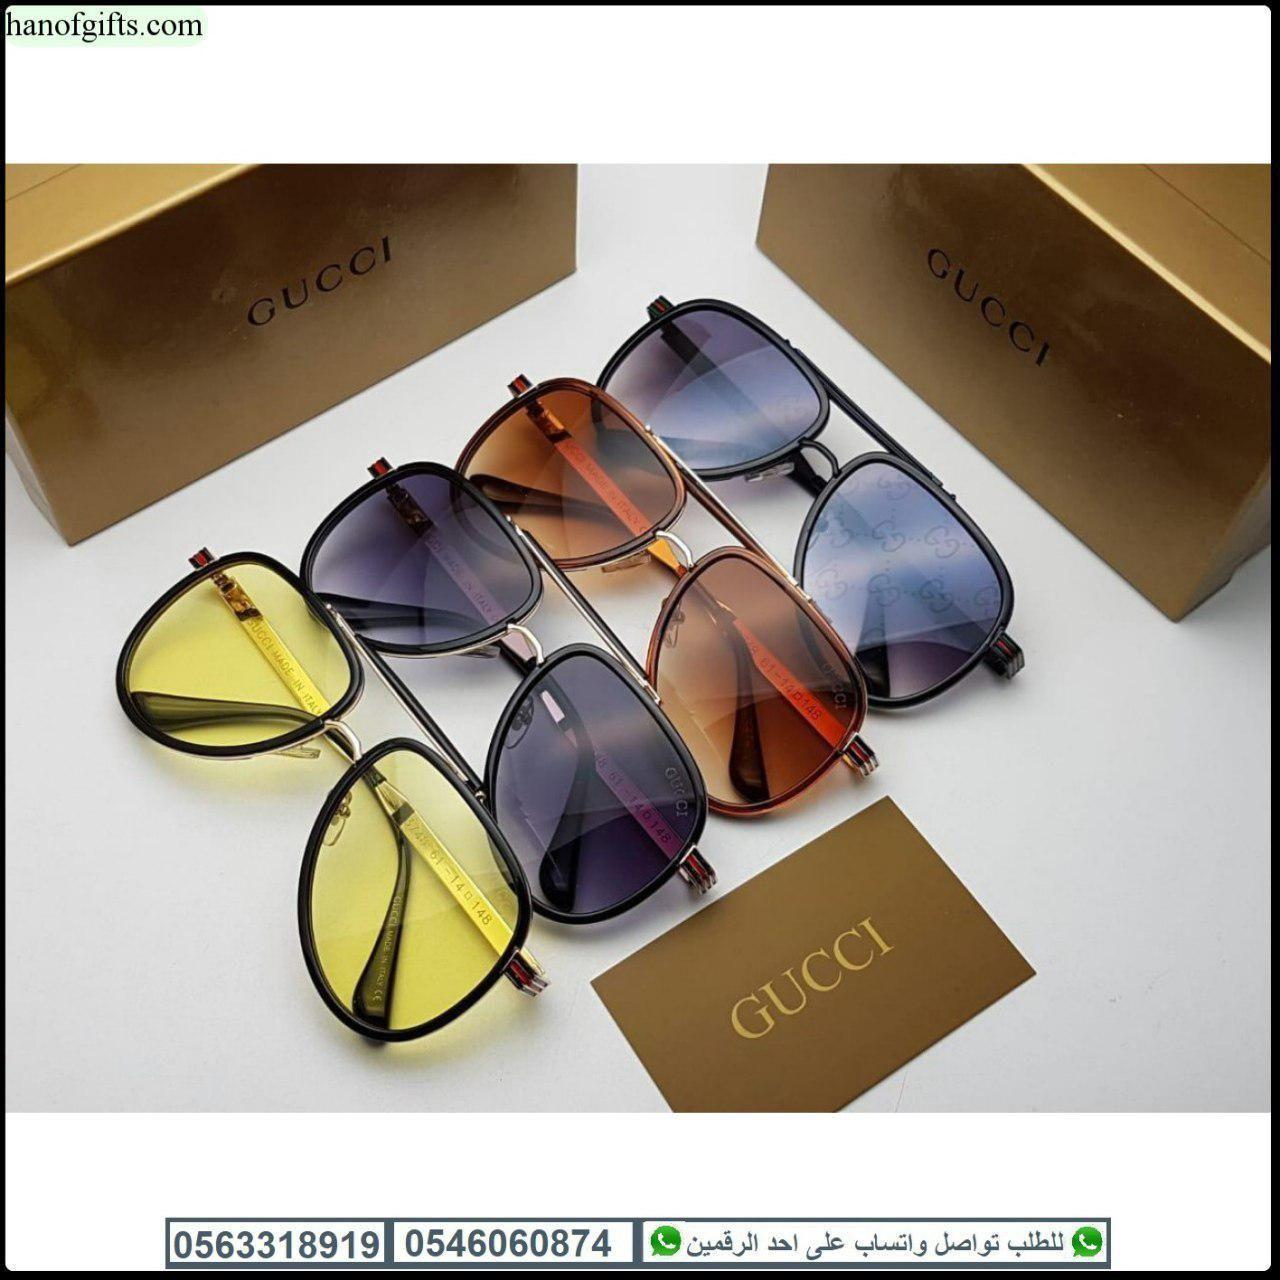 نظارات قوتشي رجالي Gucci مع جميع الملحقات و بنفس اسم الماركه هدايا هنوف Sunglasses Glasses